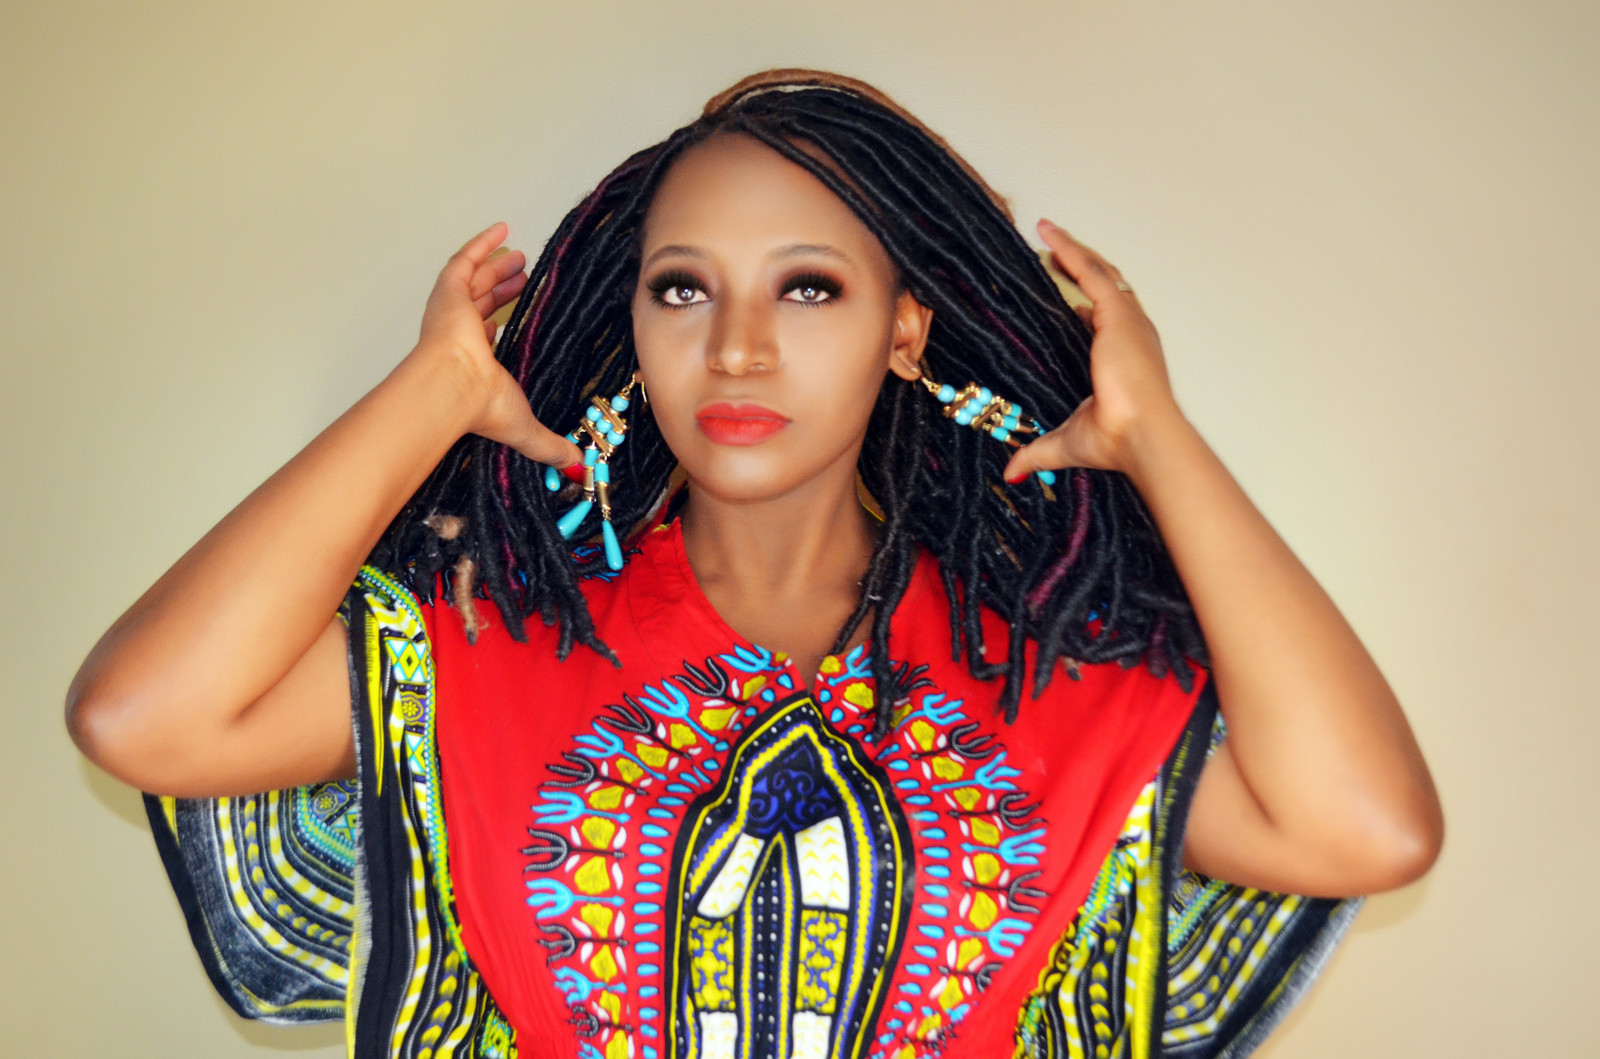 African Entertainer | Singer&Songwriter | Myra Maimoh | United States